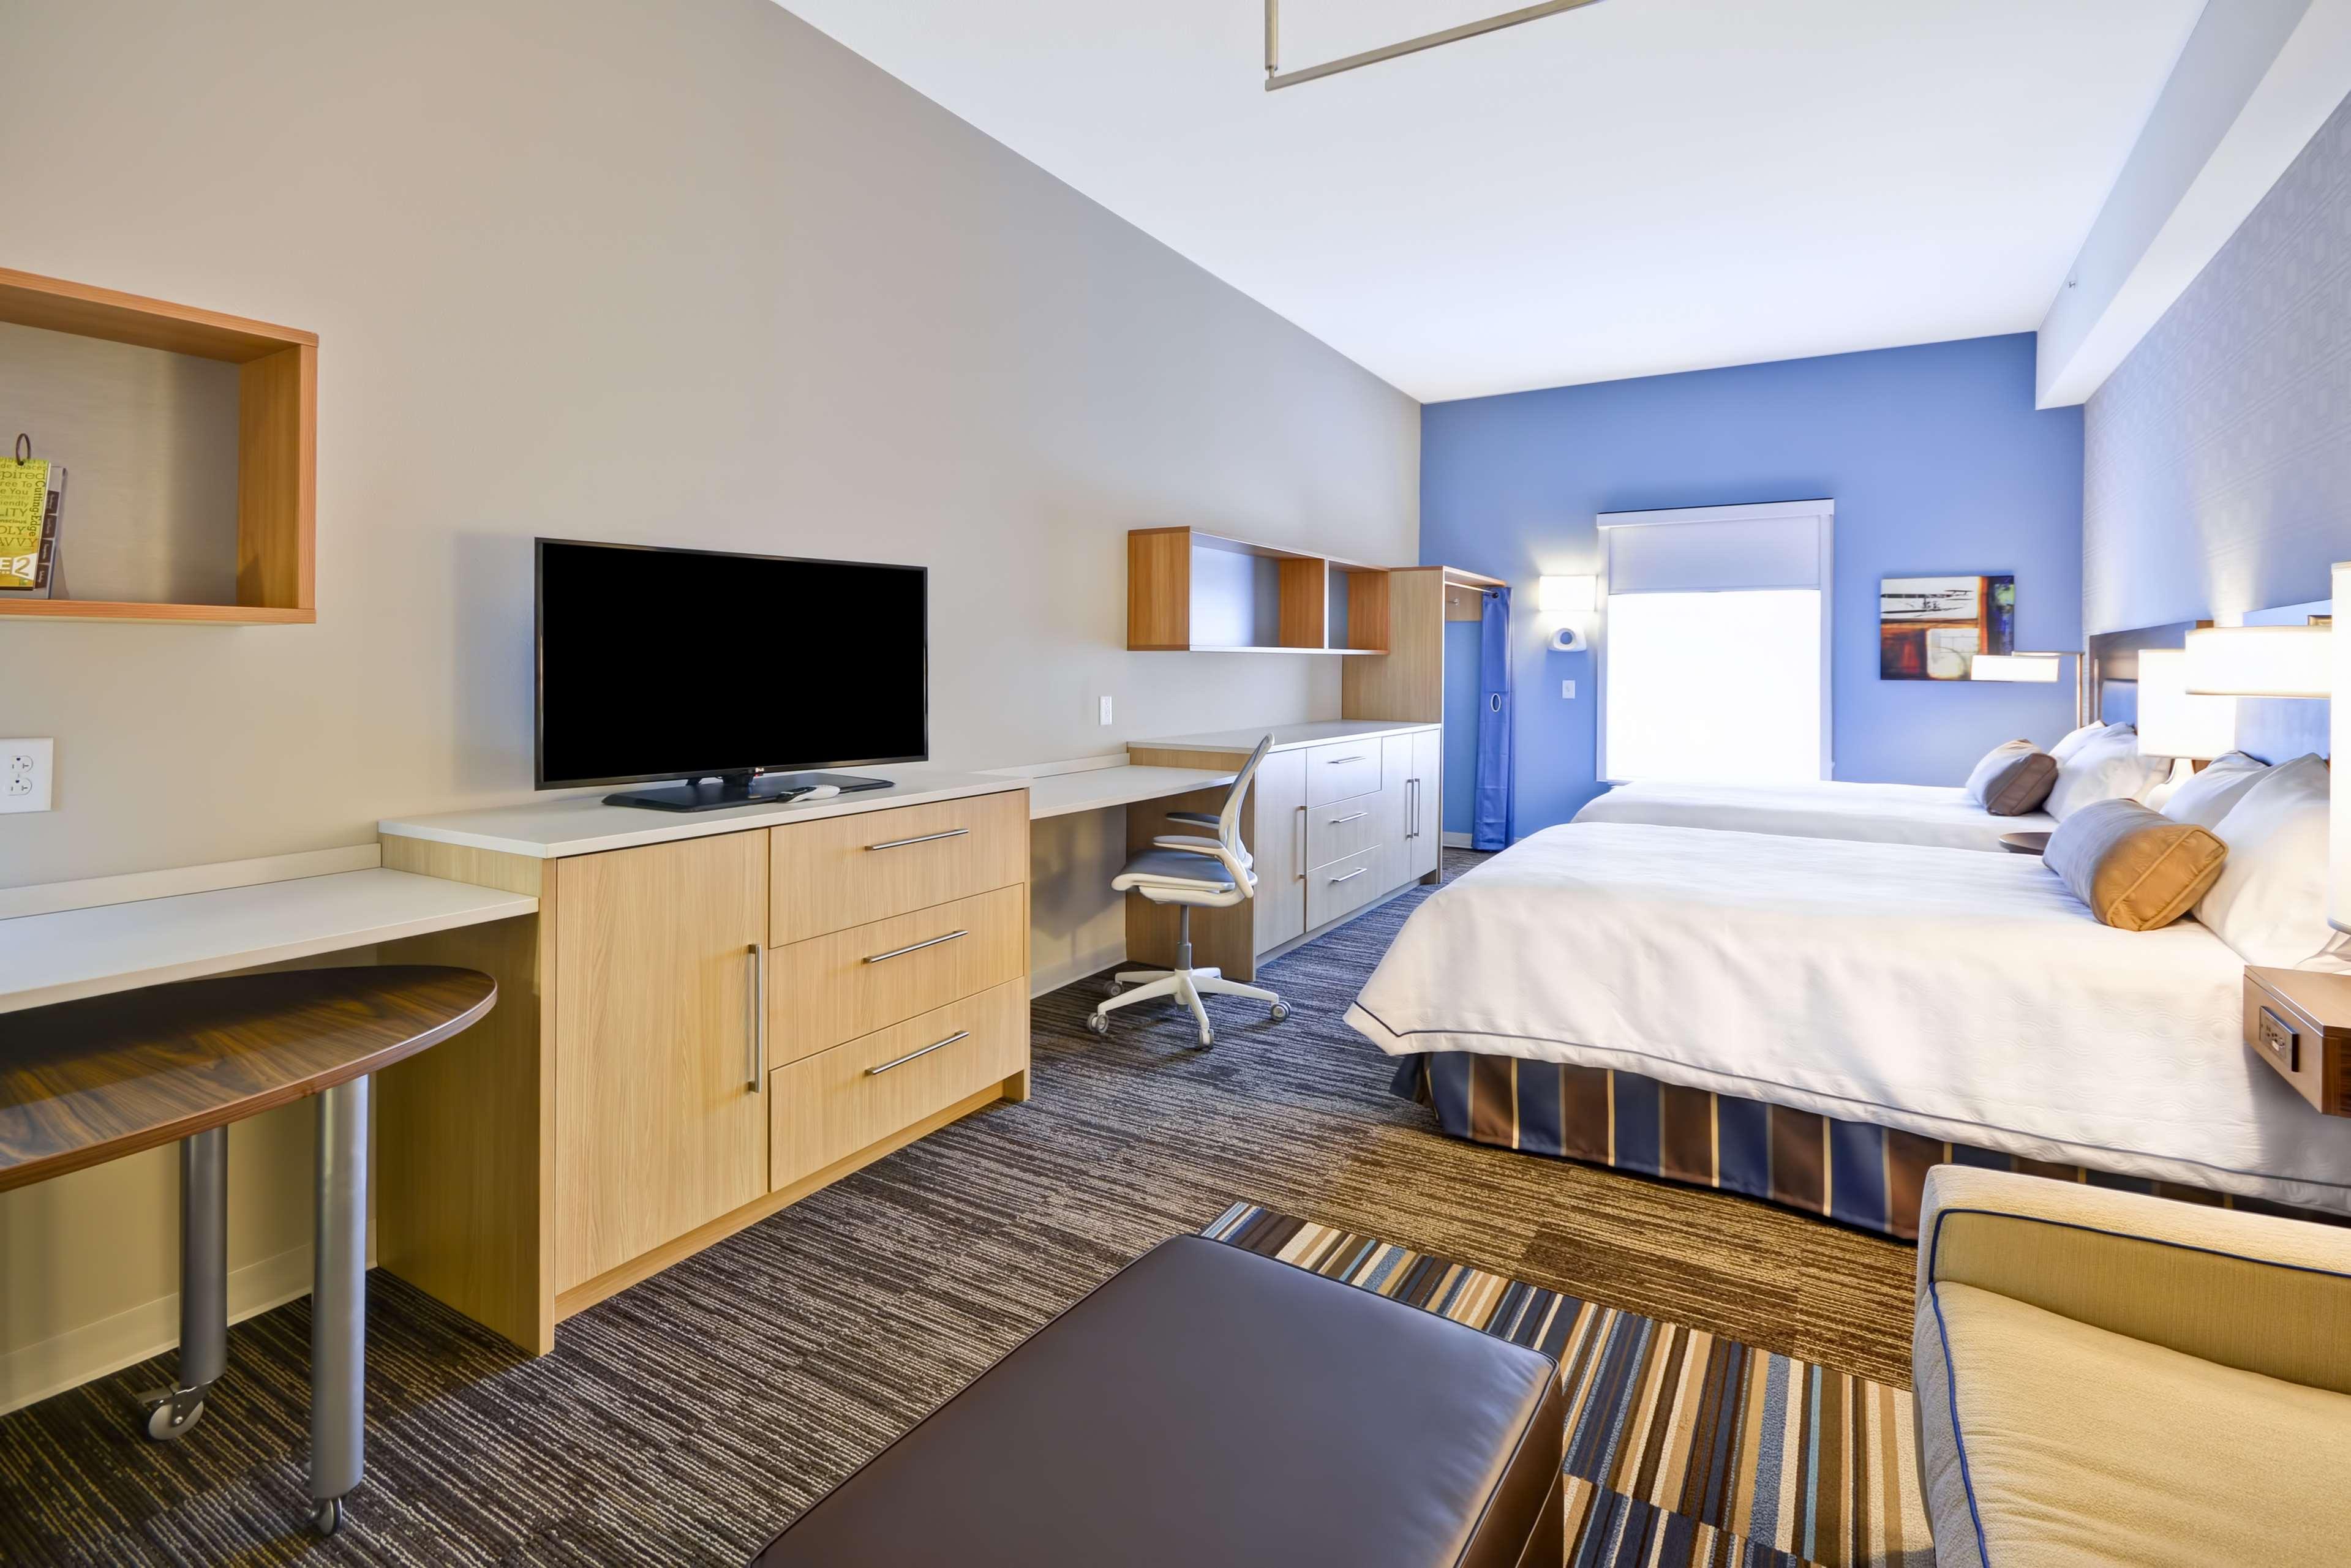 Home2 Suites by Hilton  St. Simons Island image 44